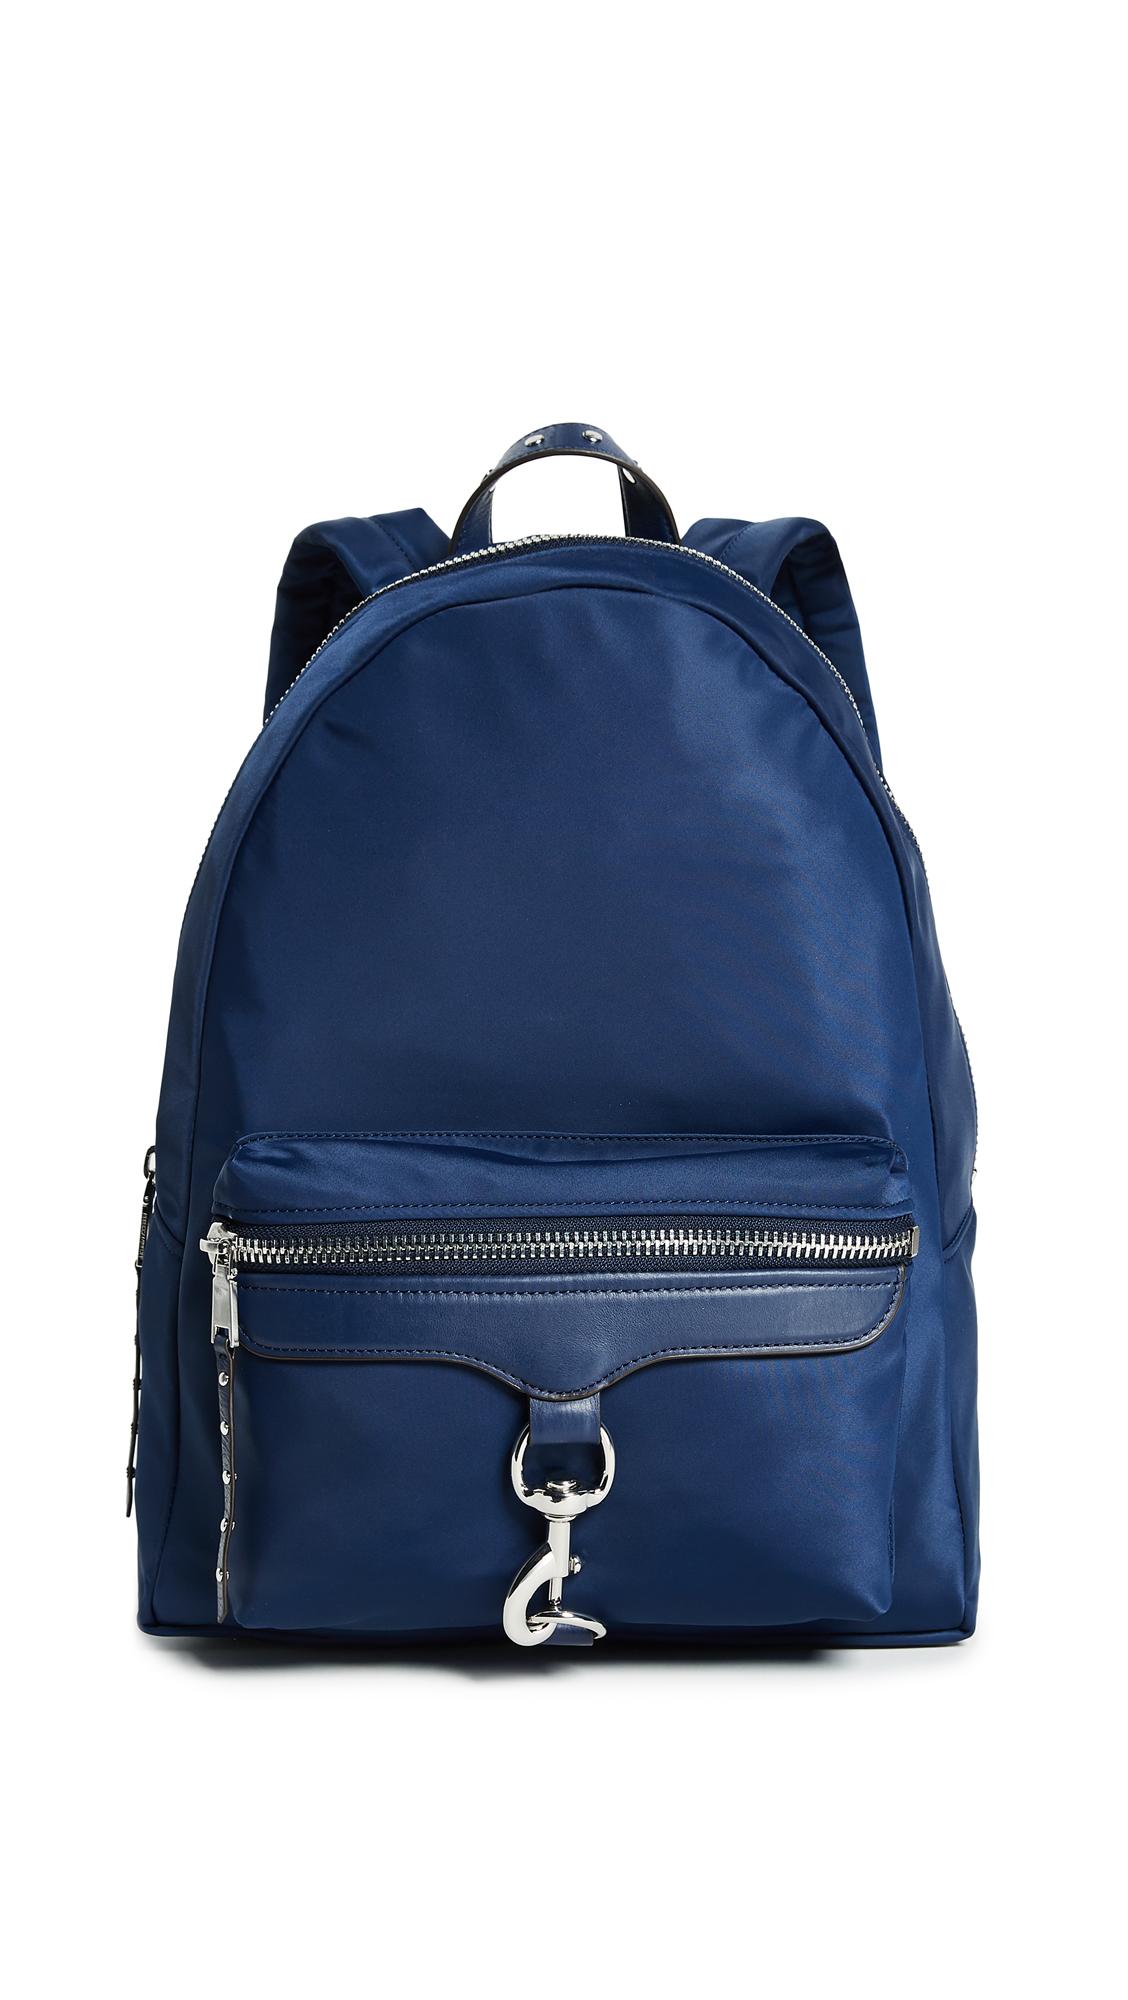 Rebecca Minkoff Always On MAB Backpack - True Navy